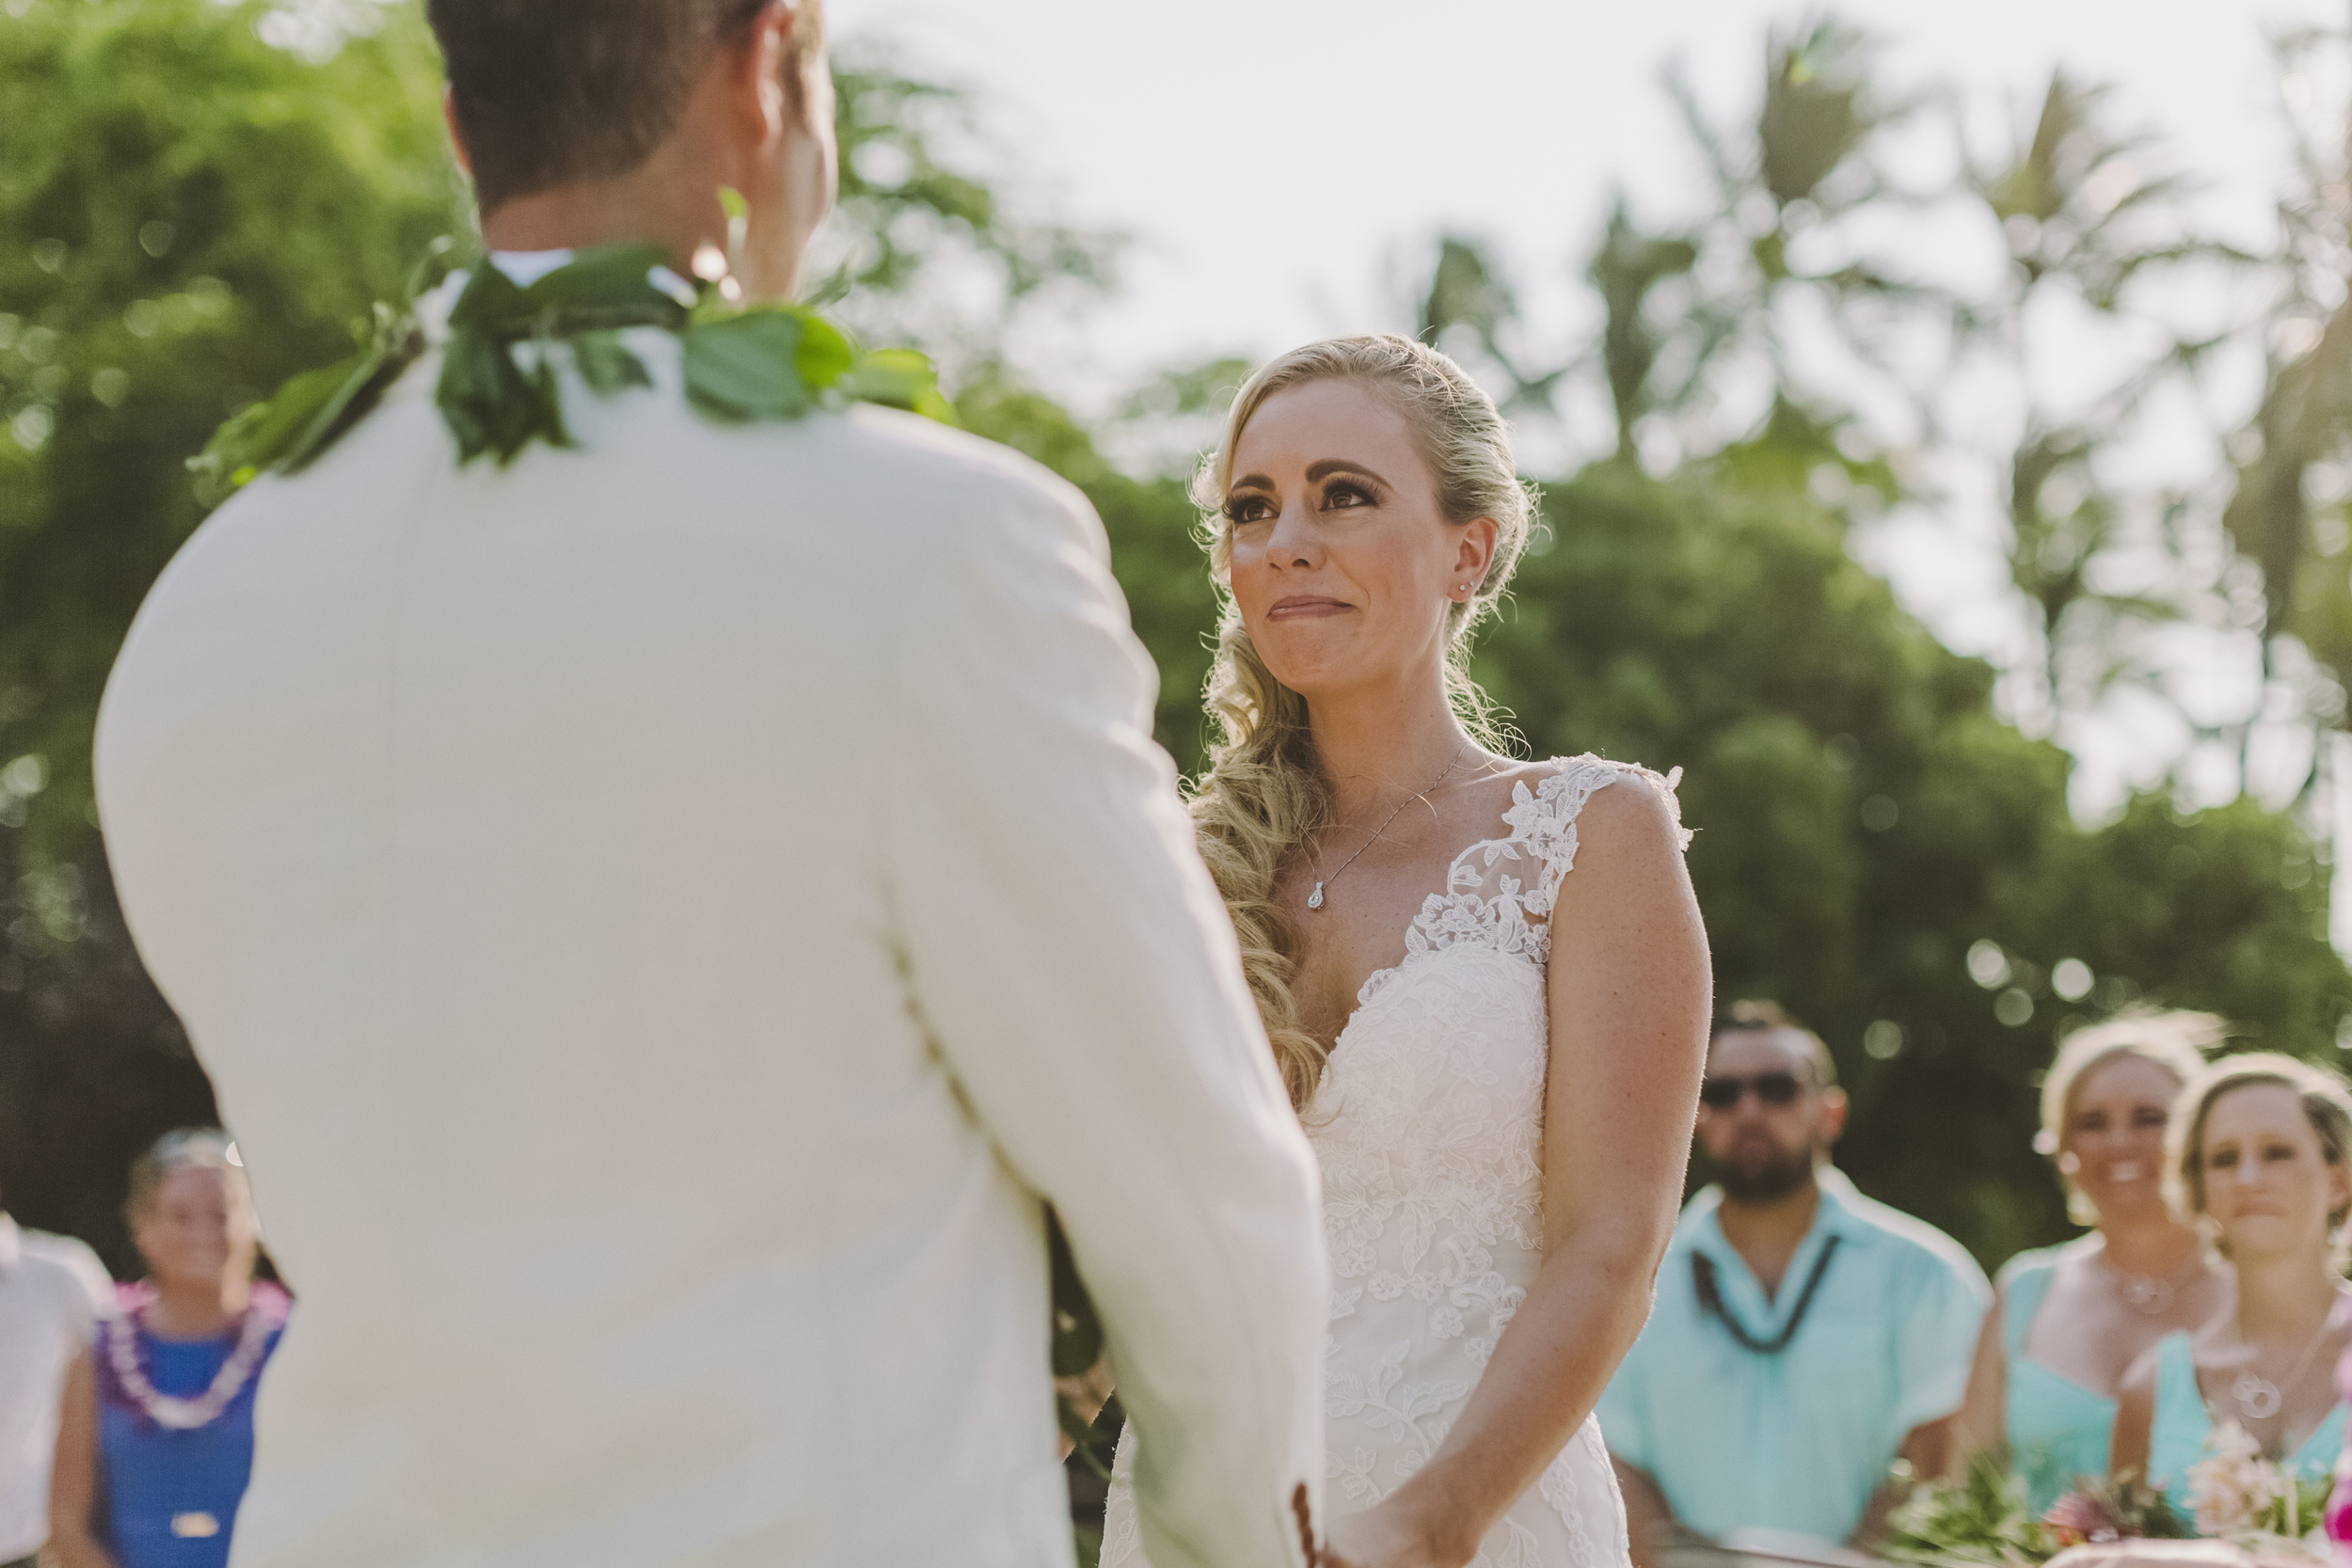 angie-diaz-photography-hawaii-wedding-photographer-kelli-jay-72.jpg